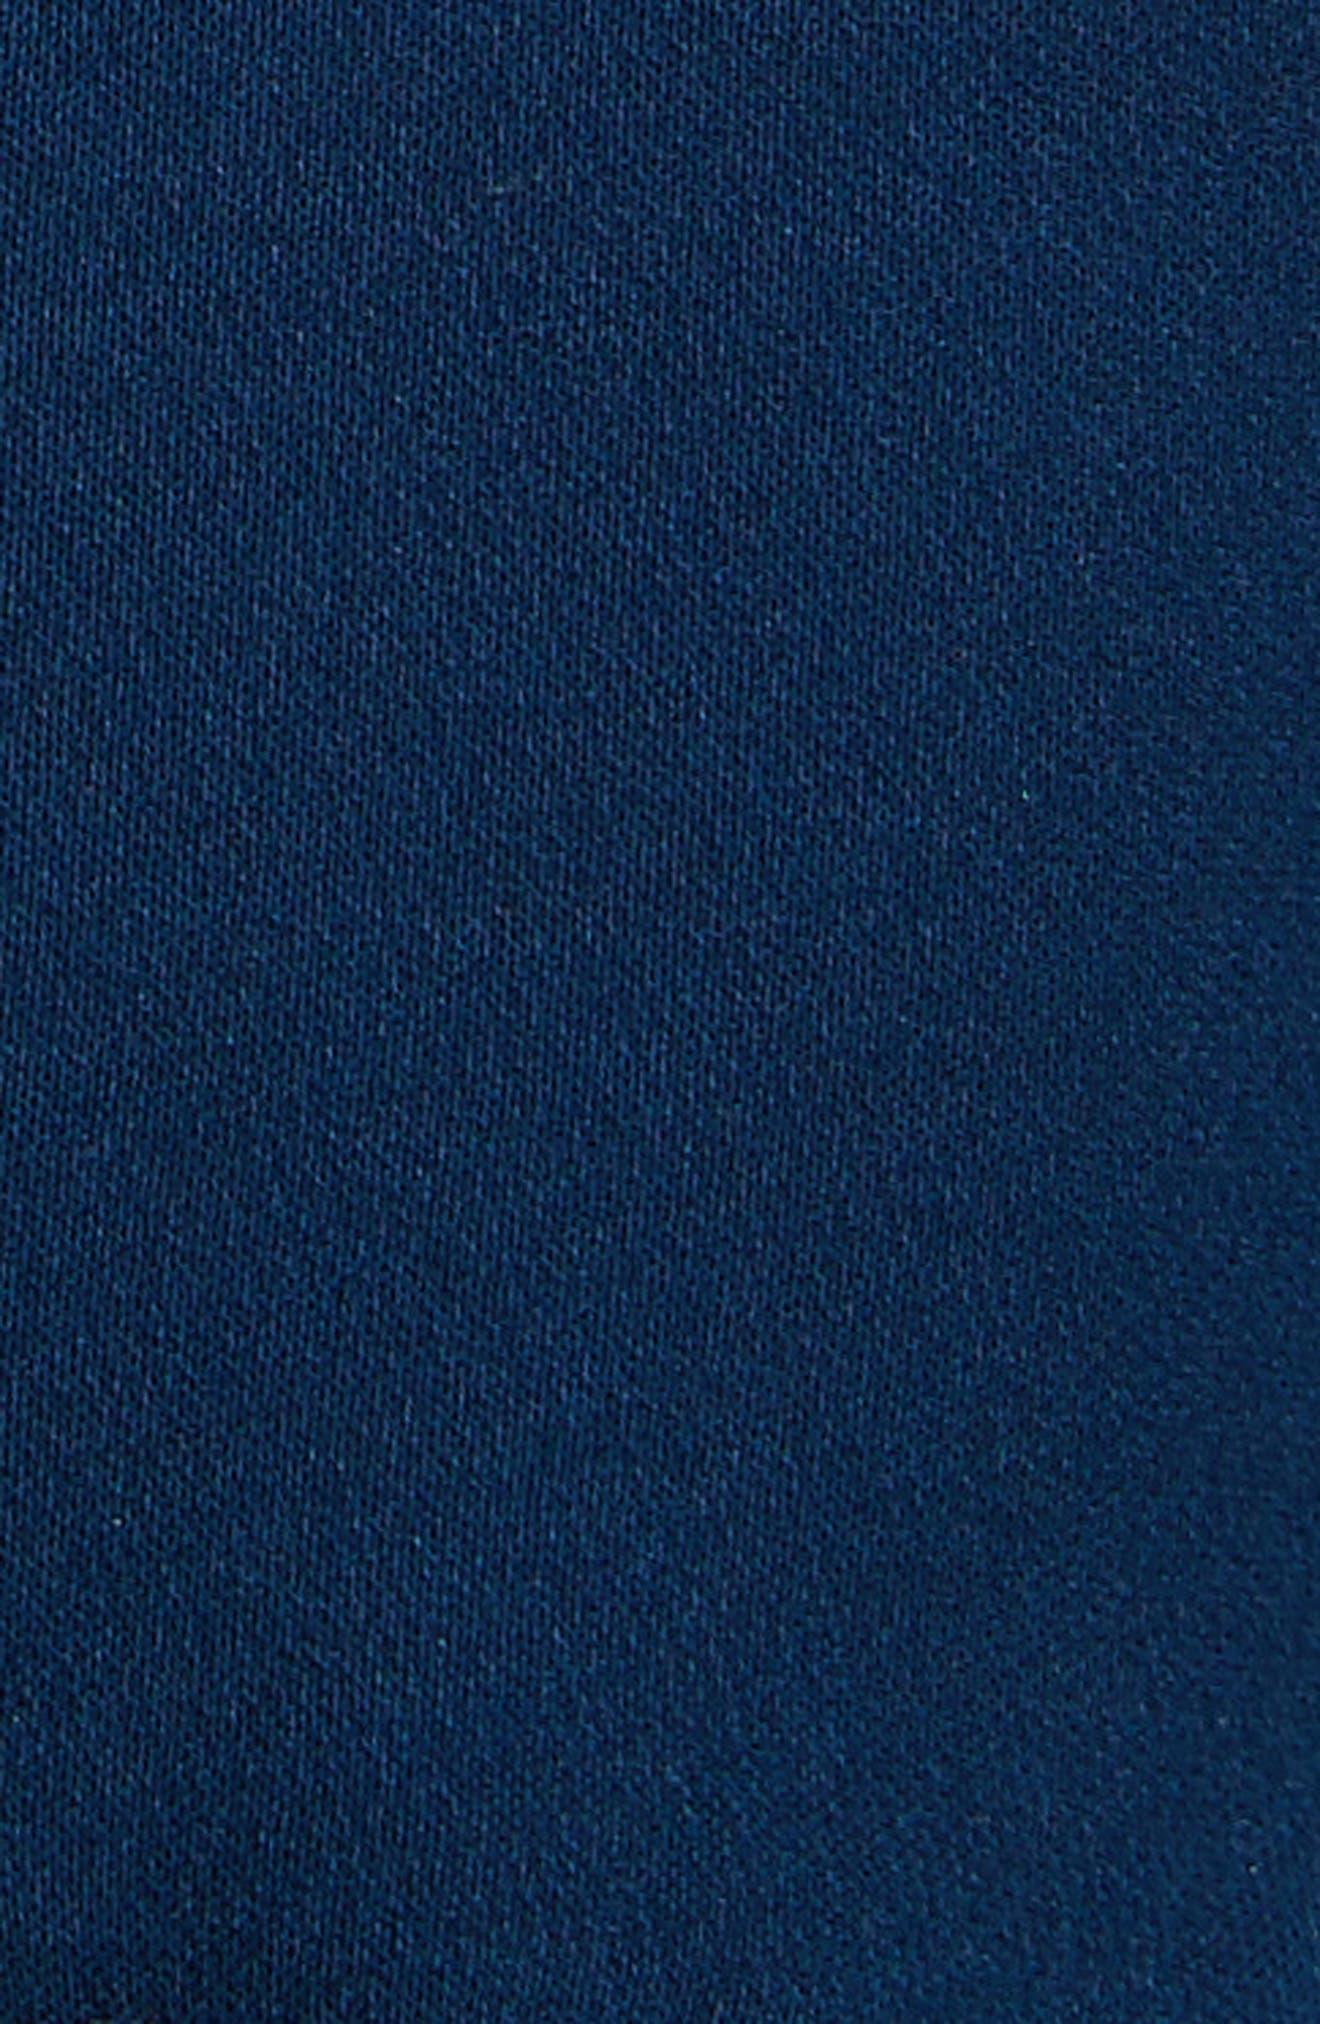 Taghrid Ruffle Silk Dress,                             Alternate thumbnail 5, color,